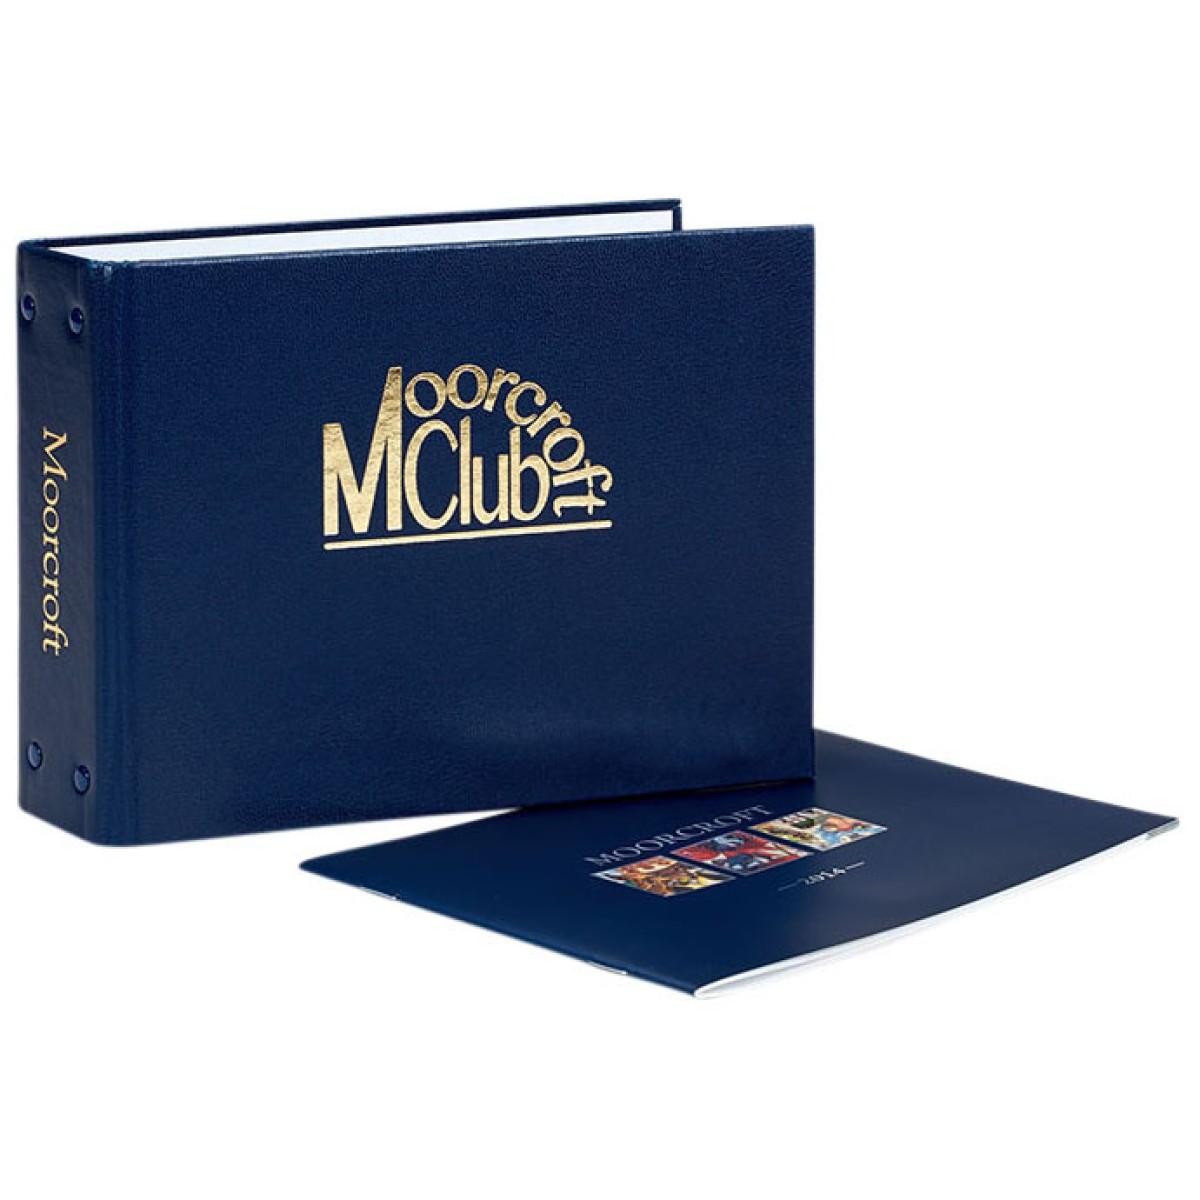 Catalogue Folder